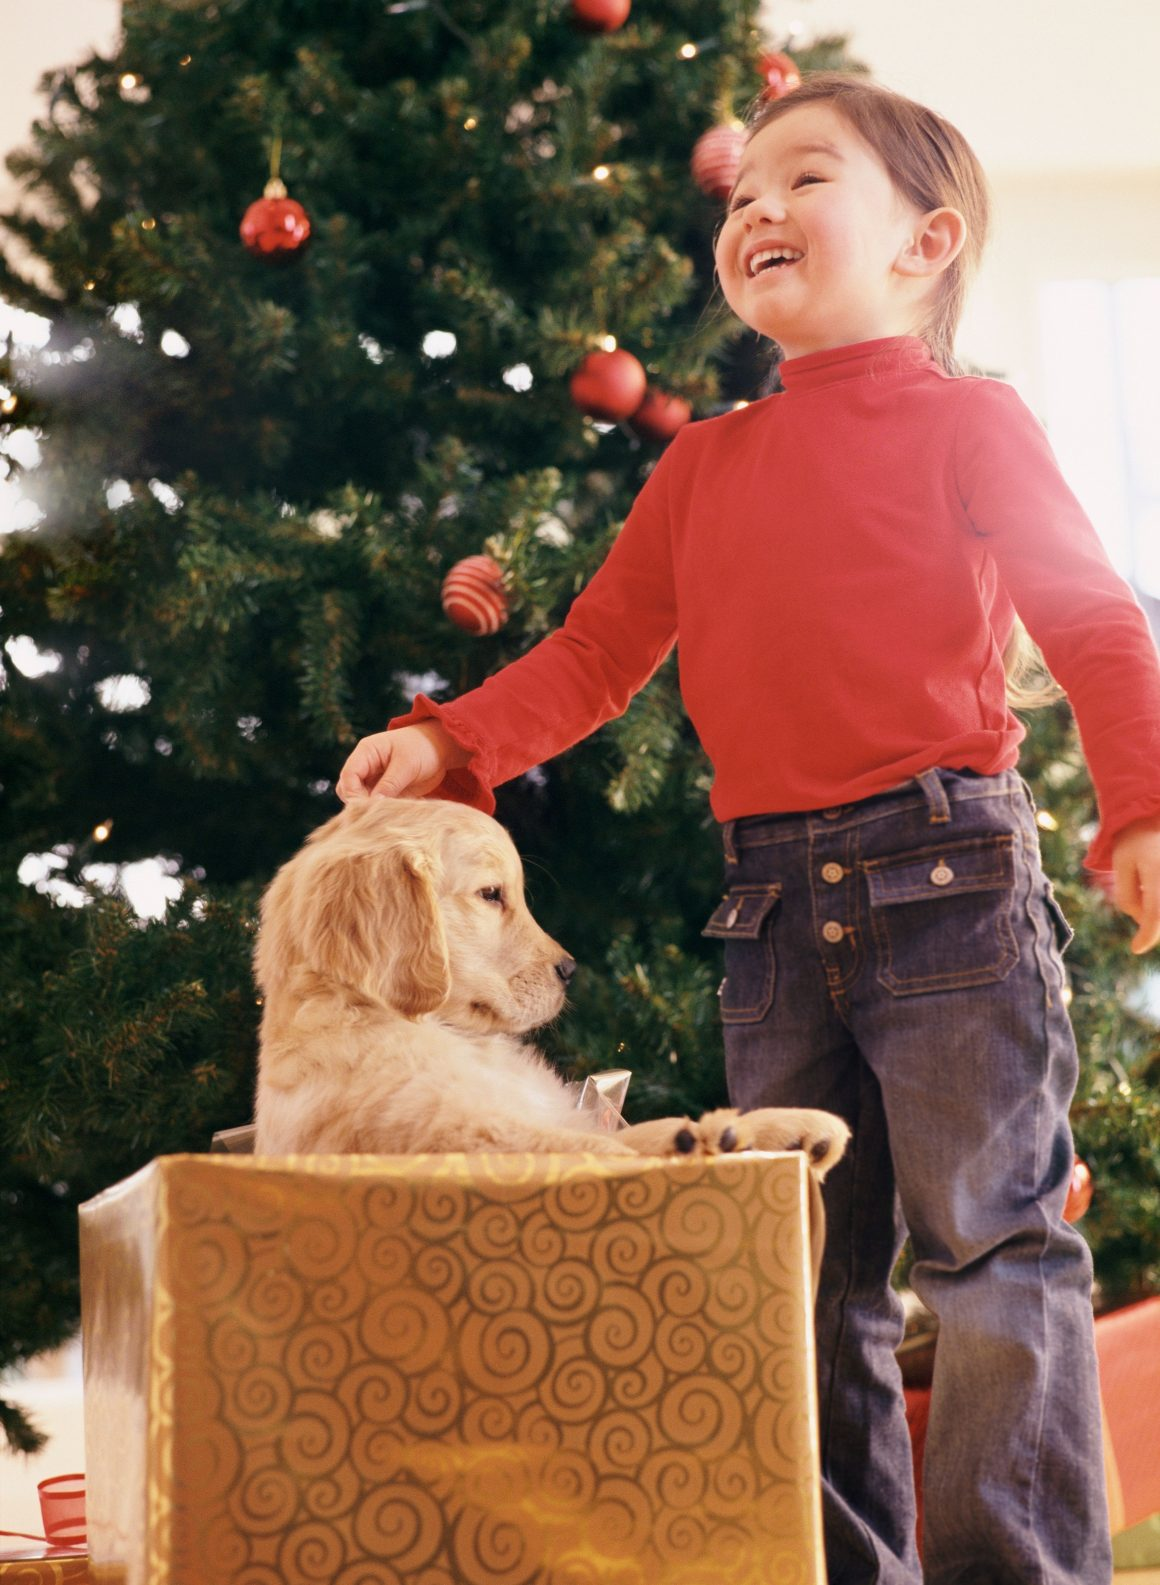 anjing di dalam kotak dengan anak laki-laki di sampingnya